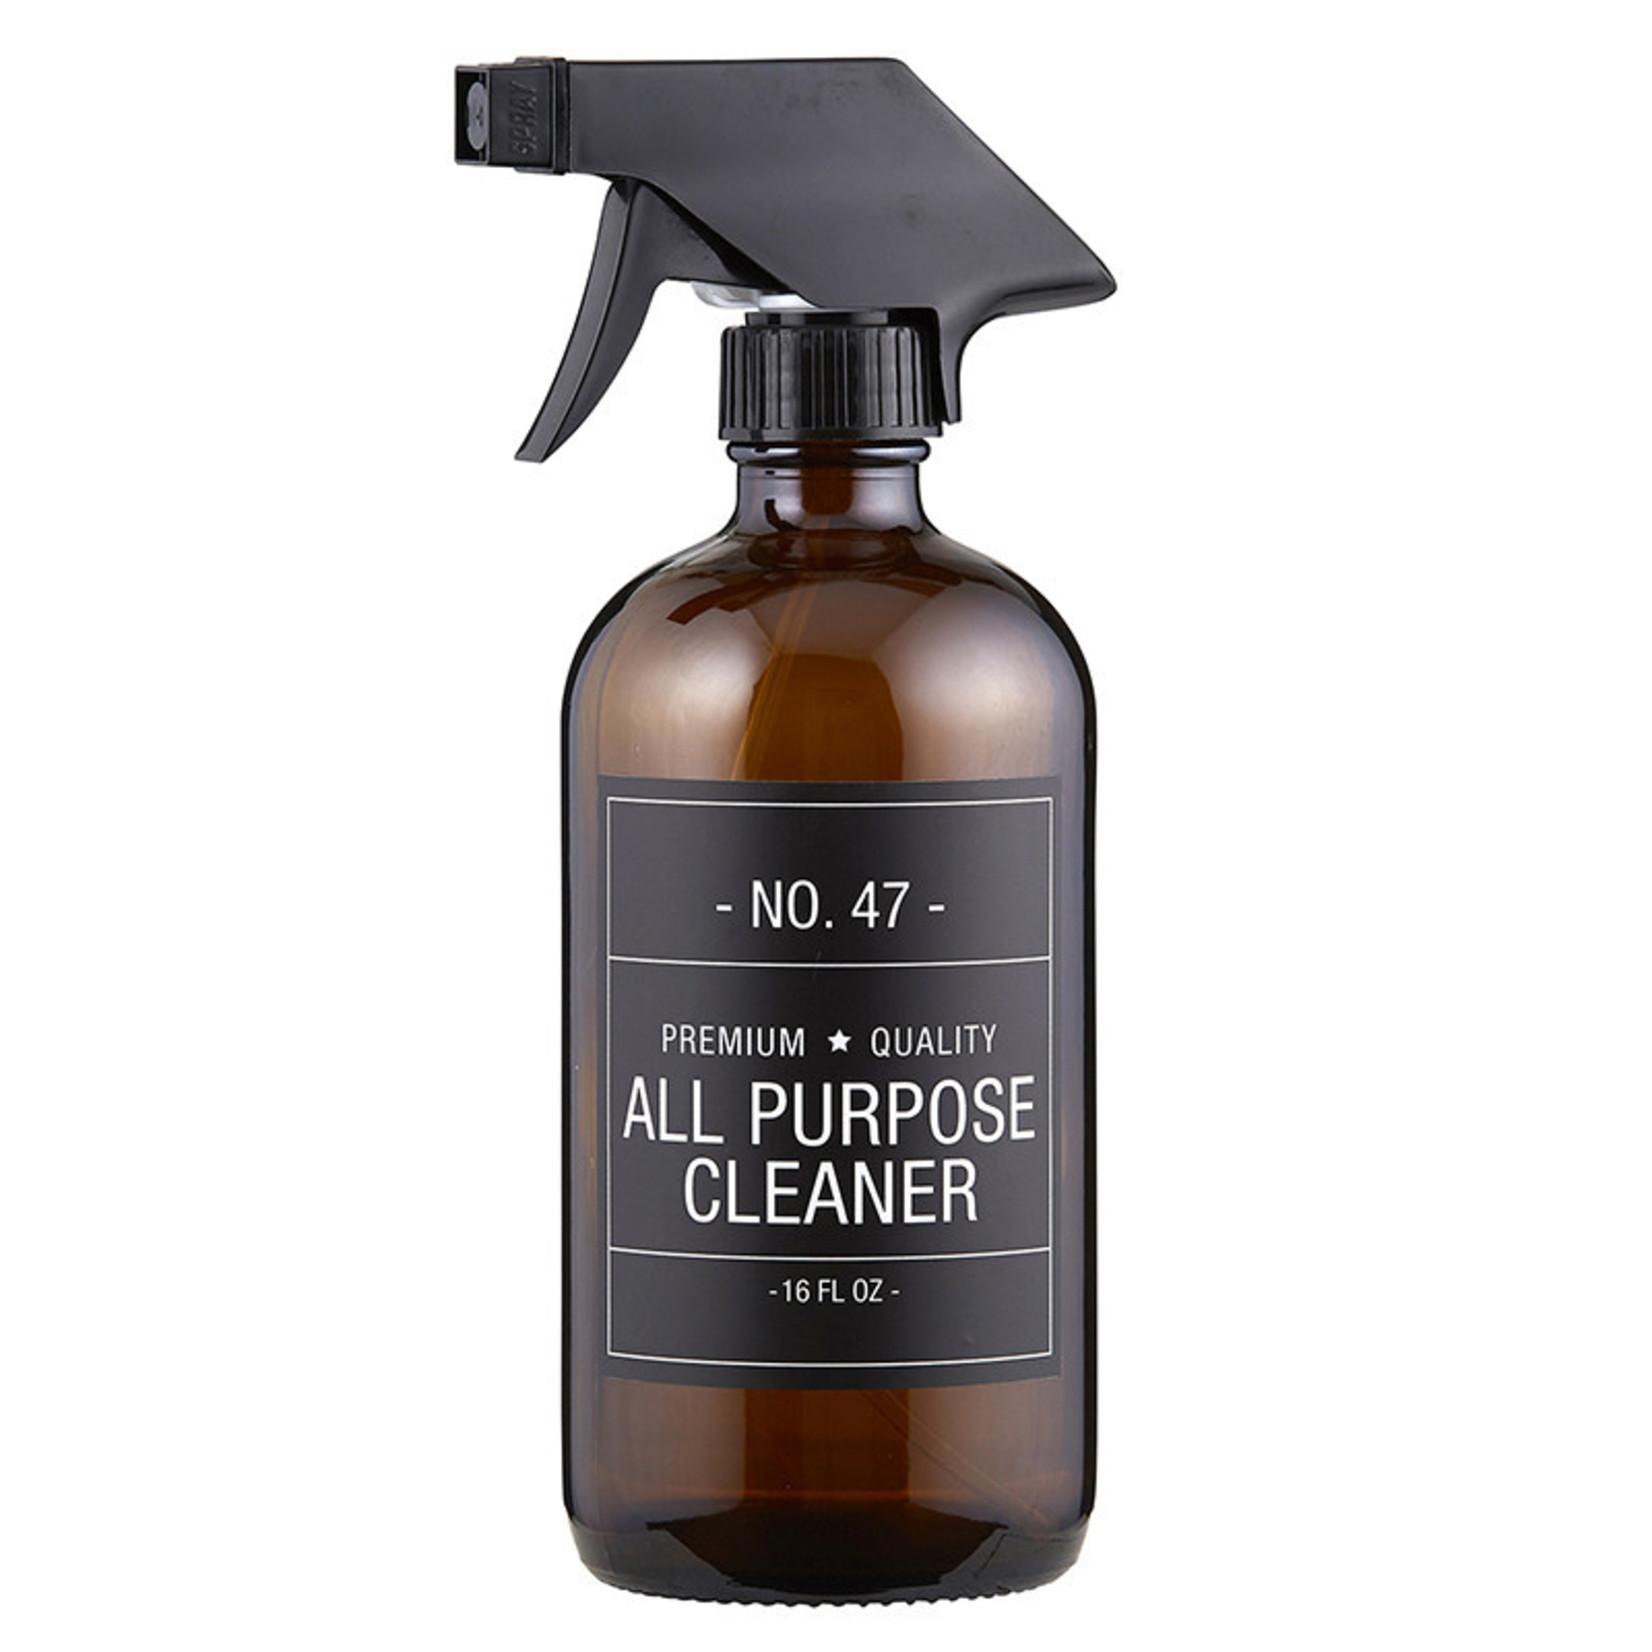 All Purpose Cleaner Bottle, Black Label